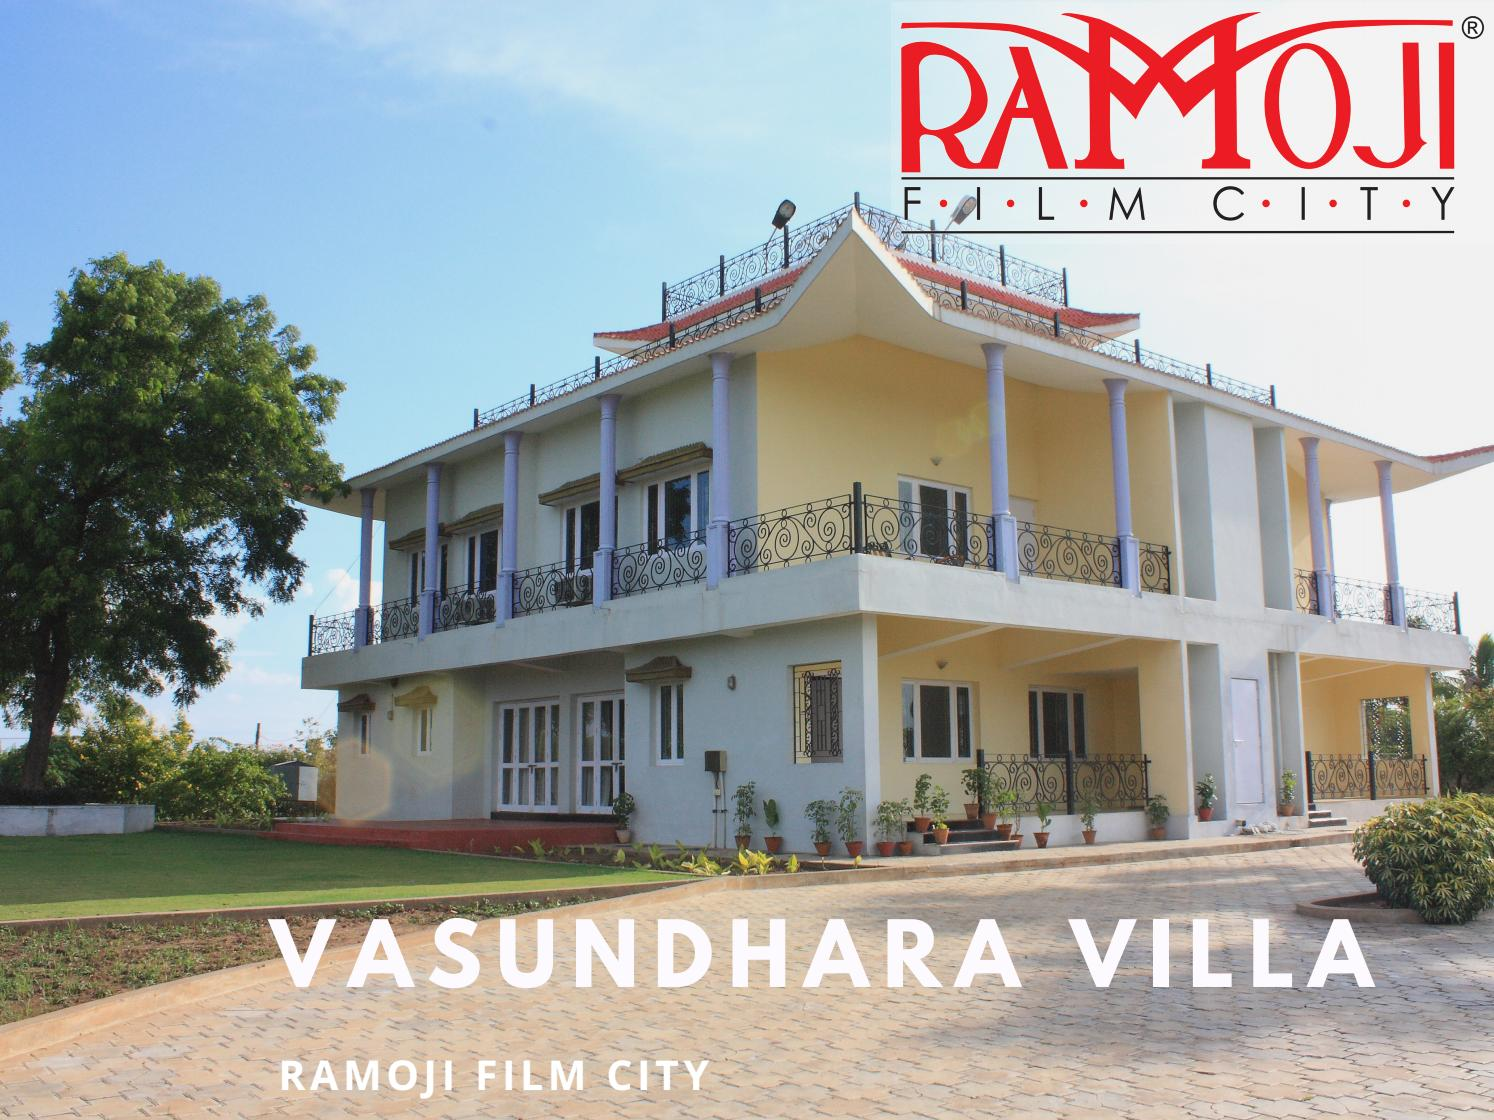 Vasundhara Villa At Ramoji Film City By Sandeepch408 Issuu